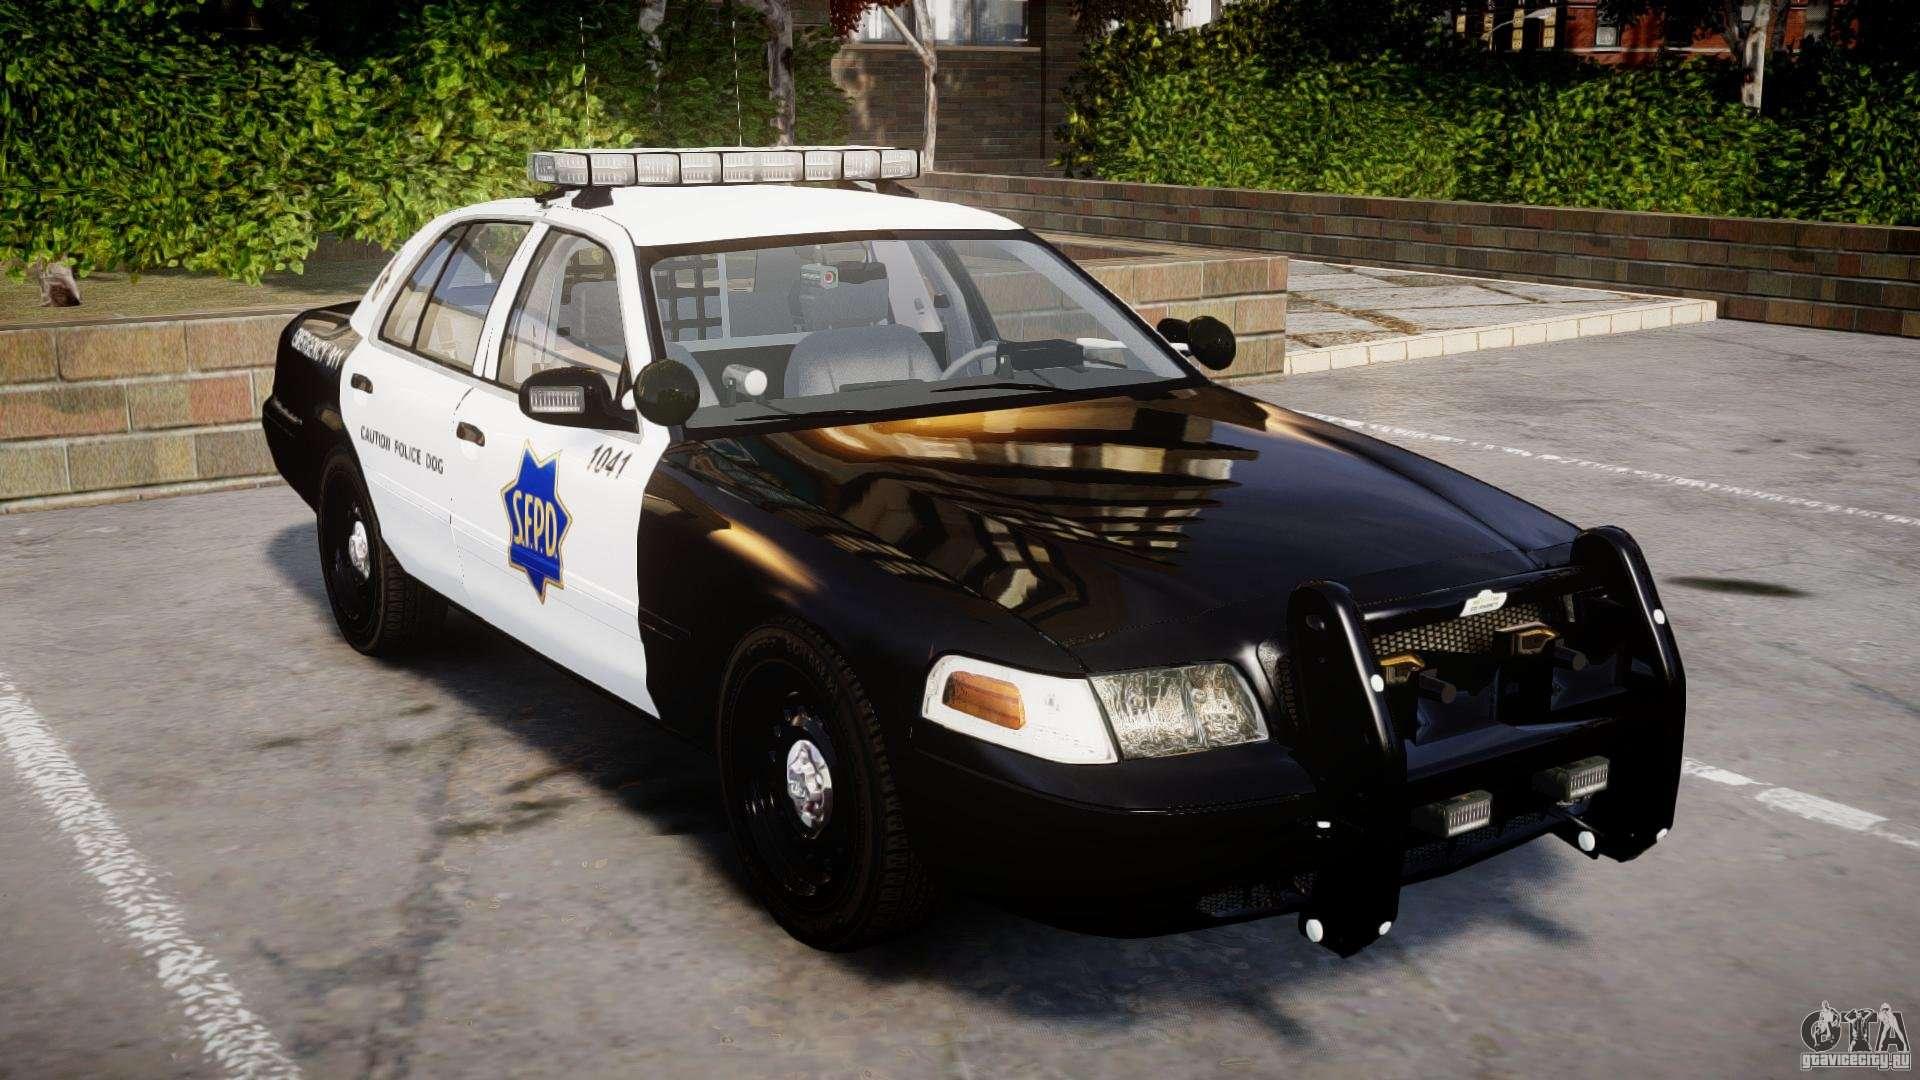 Image Result For Ford Gt Police Car